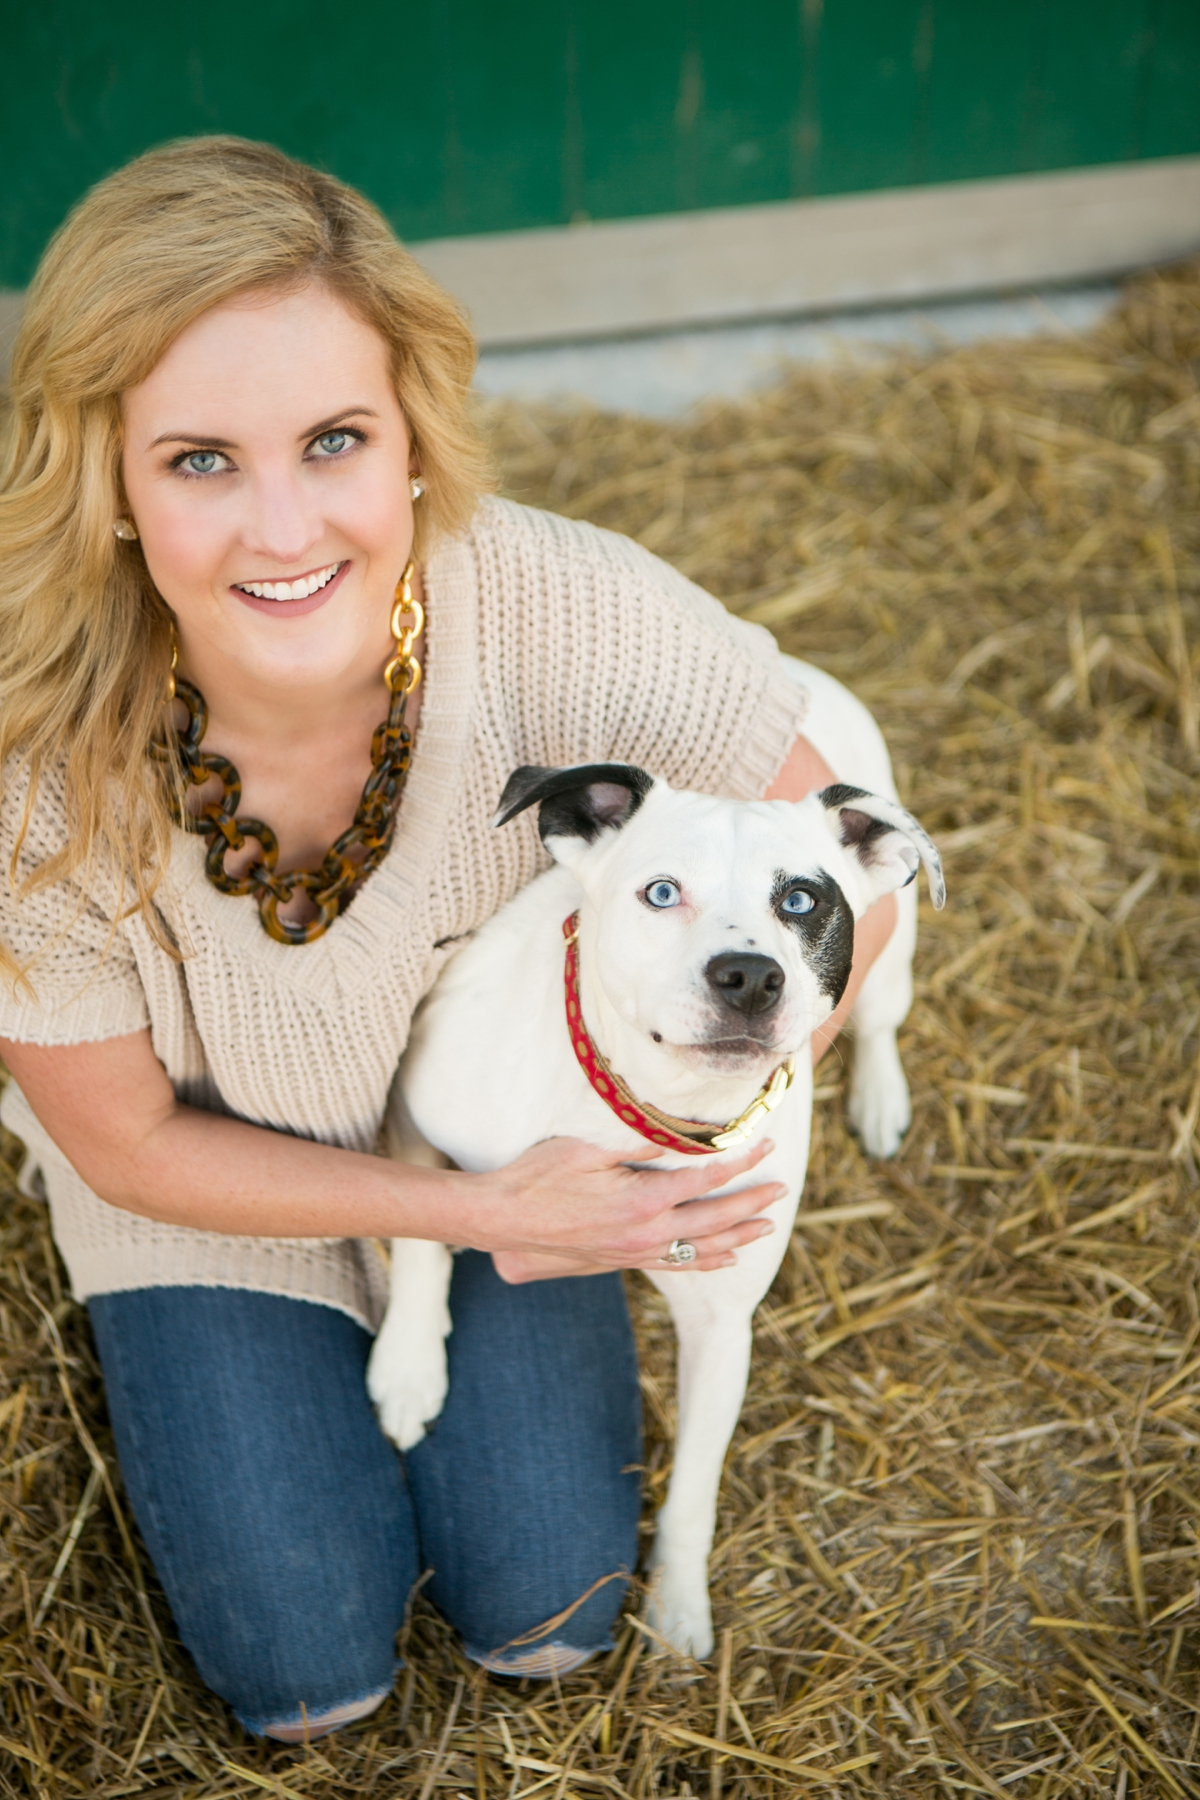 Family Photos with Pets | Nashville Family Photographer